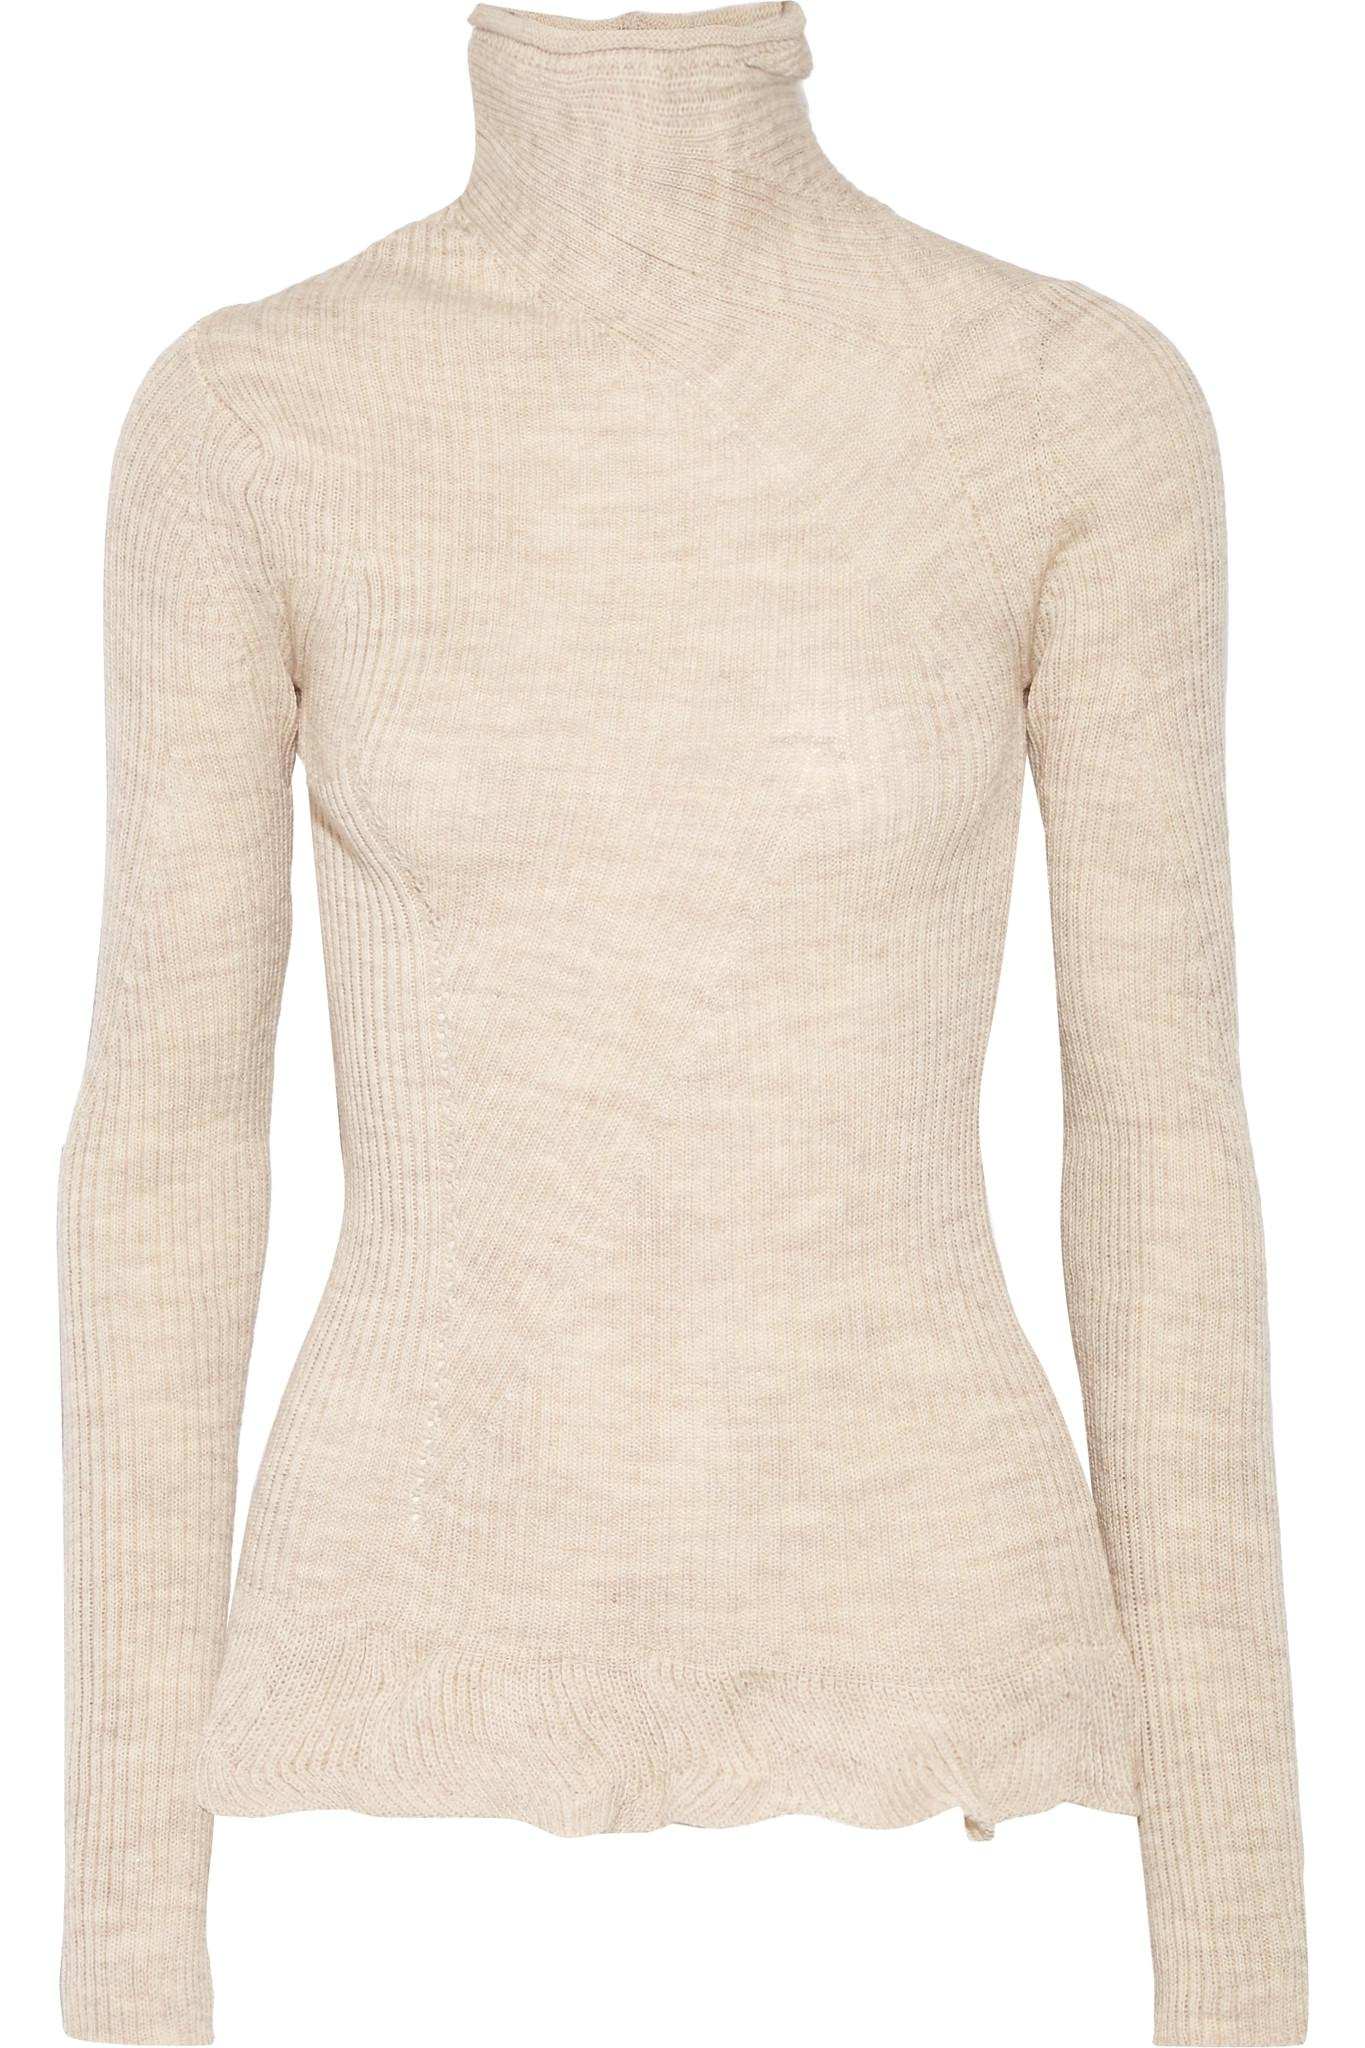 Acne Rosie Paneled Ribbed Merino Wool Turtleneck Sweater | Lyst